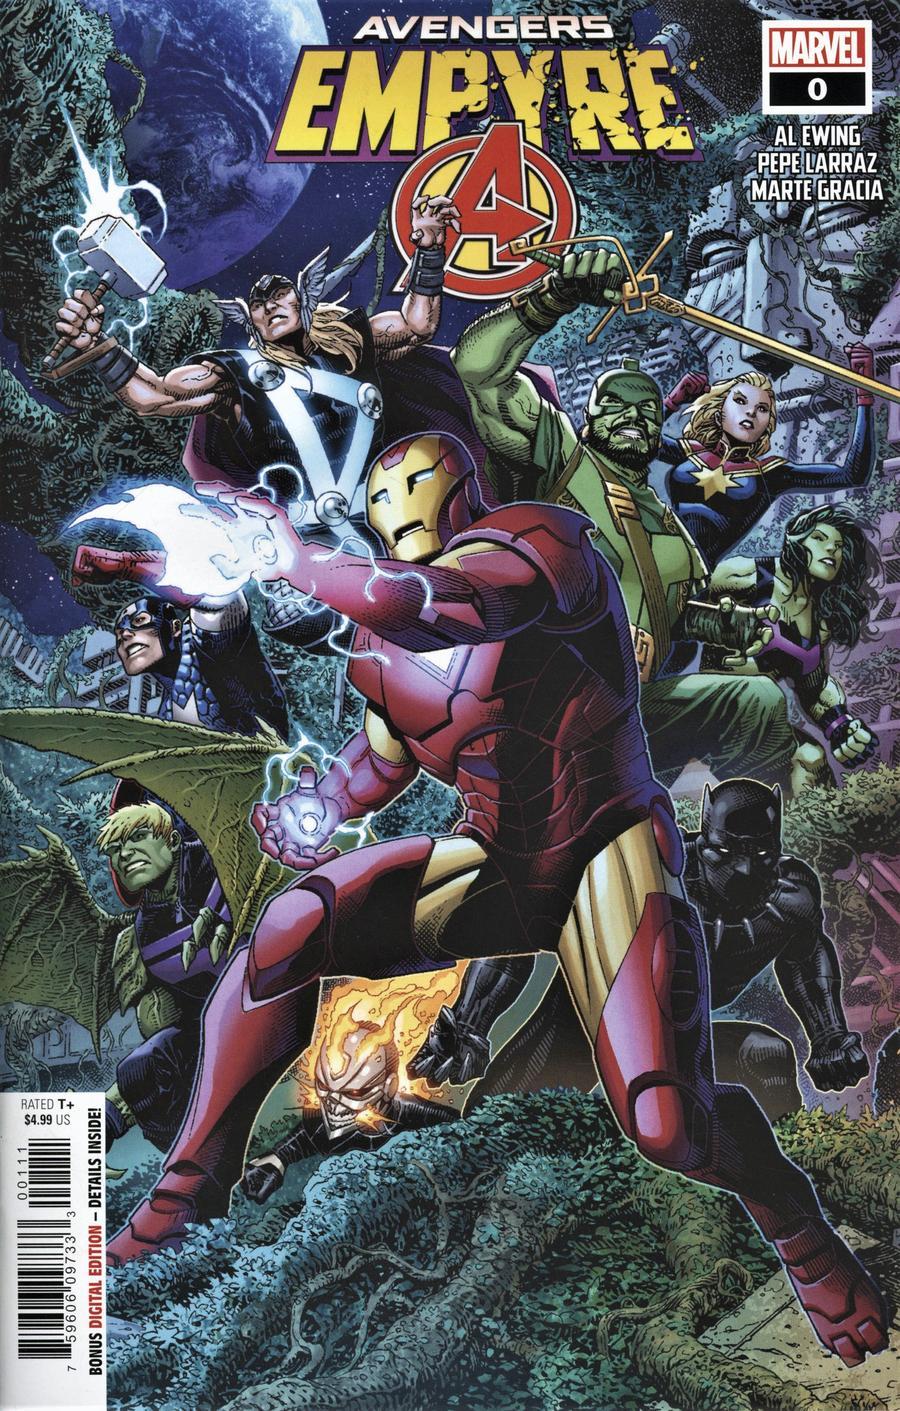 Empyre #0 Avengers Cover A Regular Jim Cheung Cover